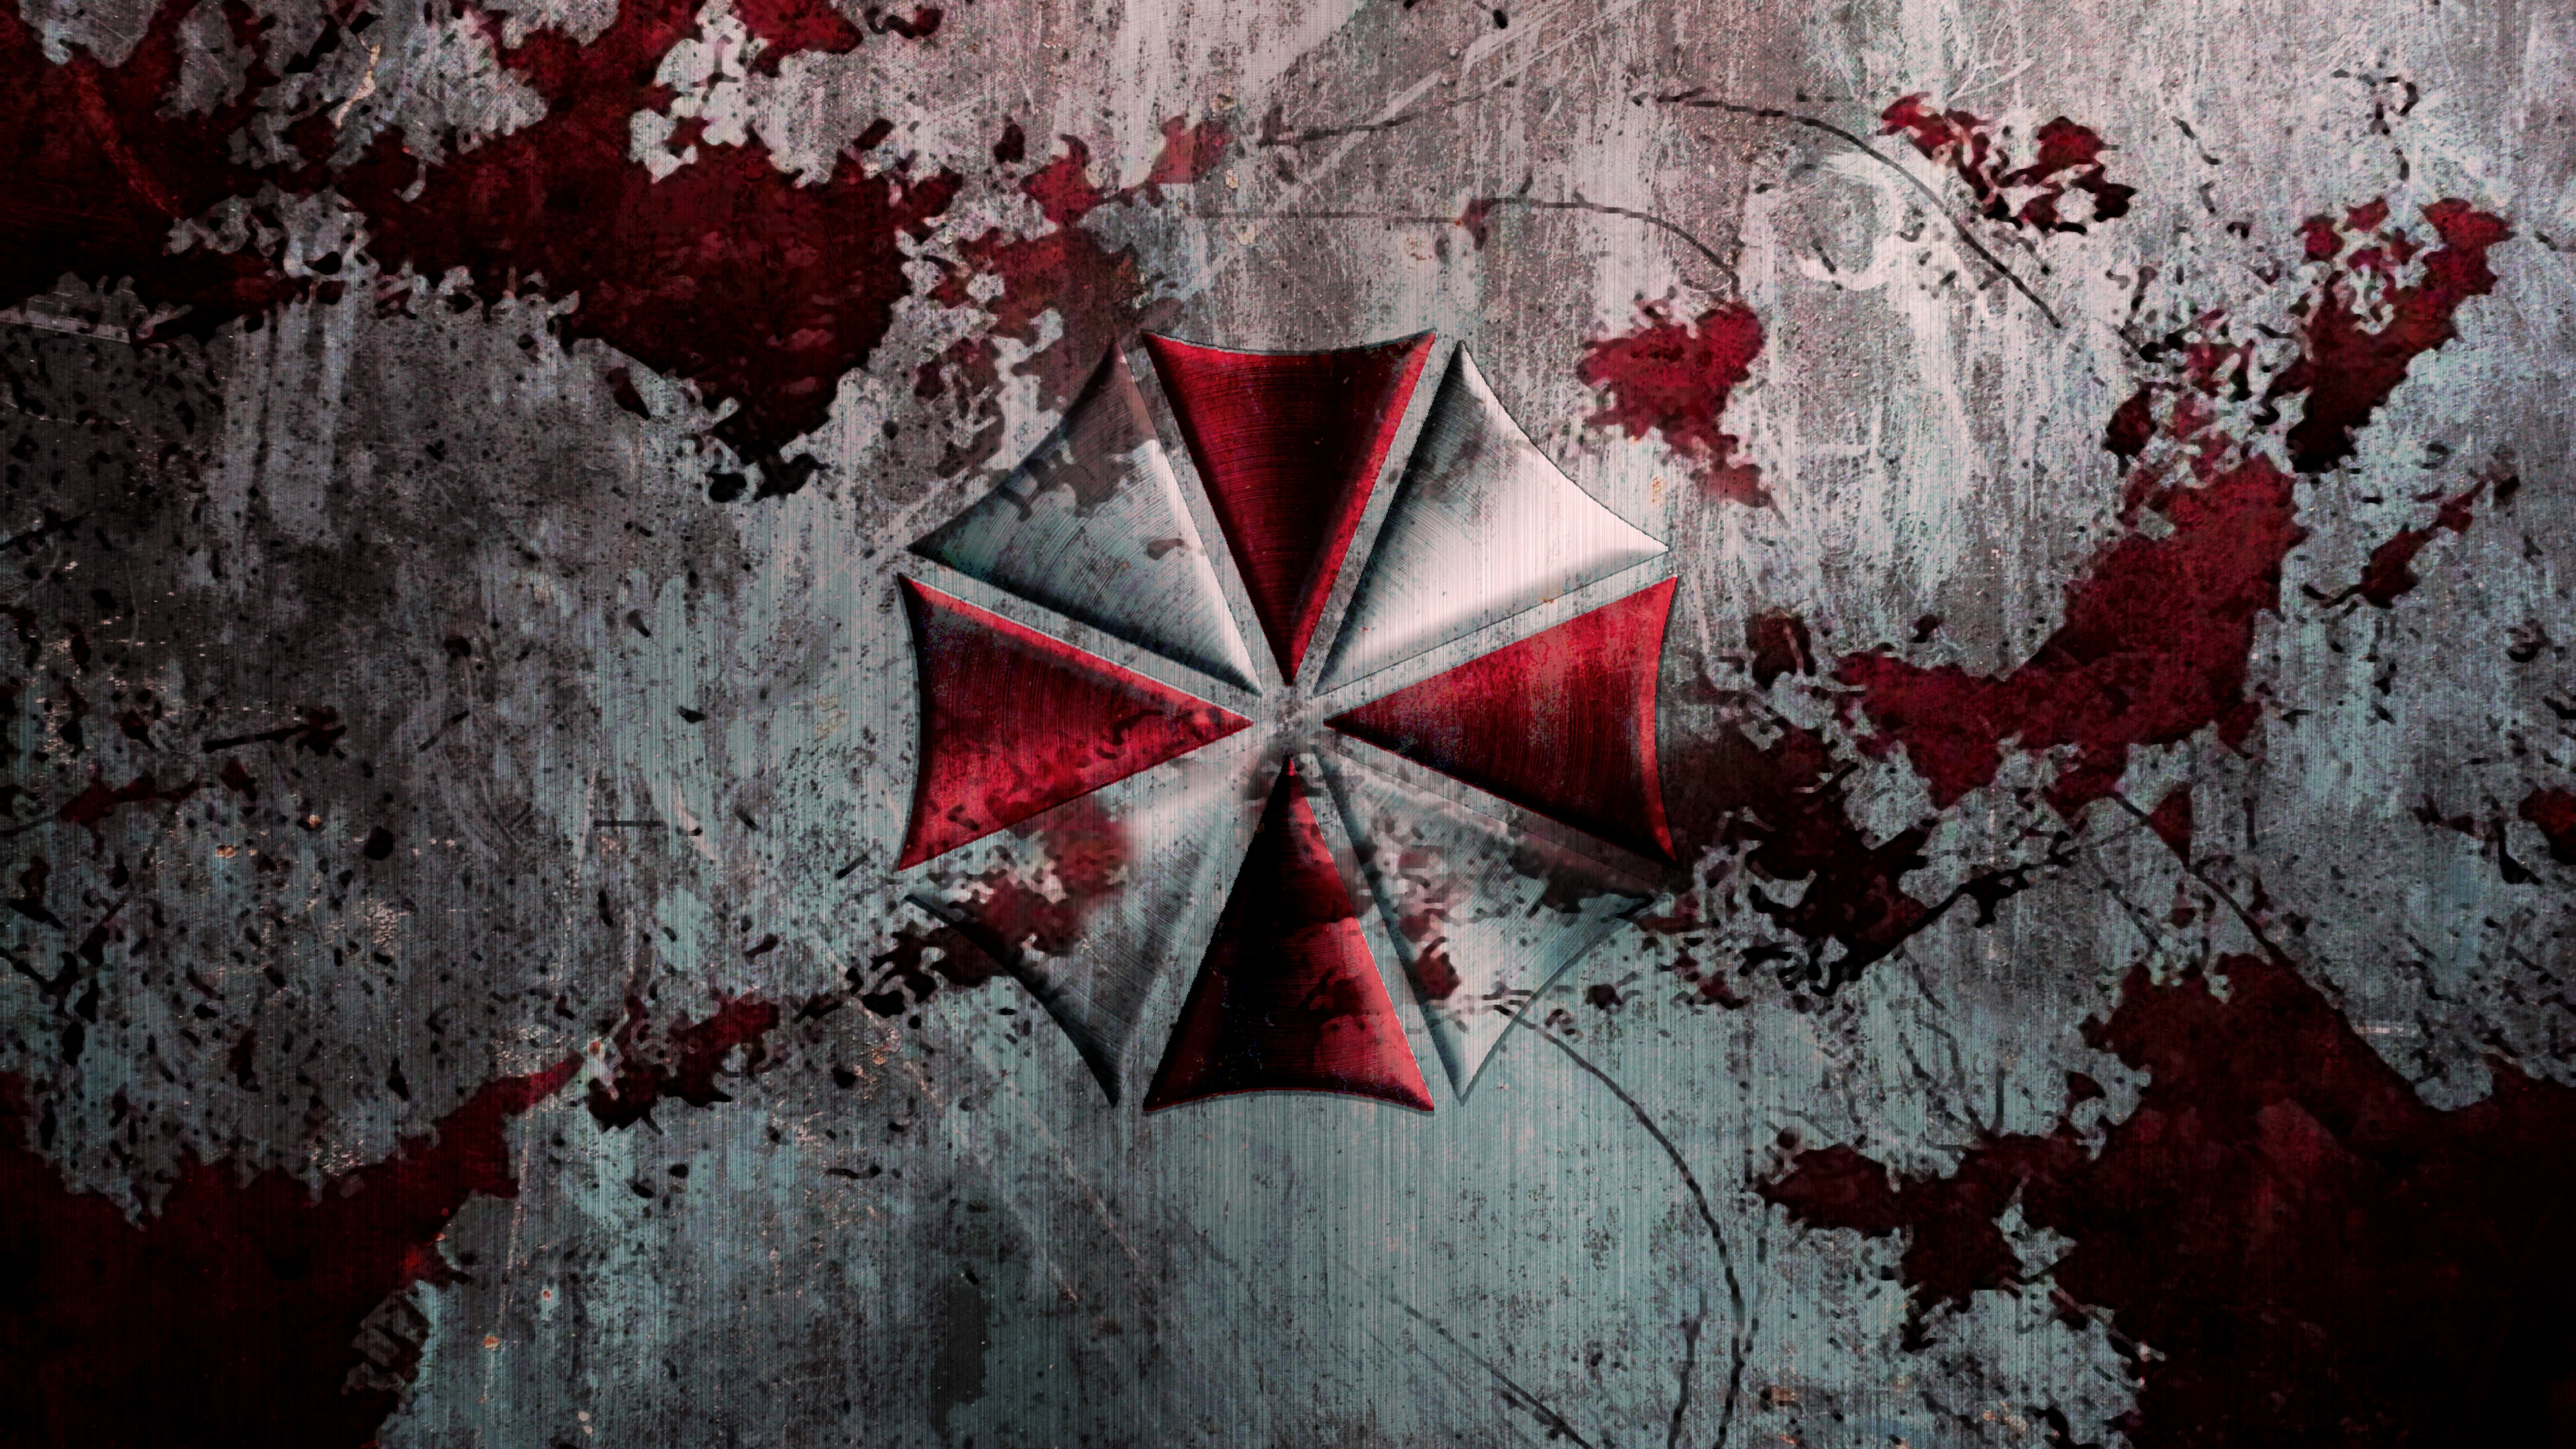 48 Hd Resident Evil Wallpaper On Wallpapersafari